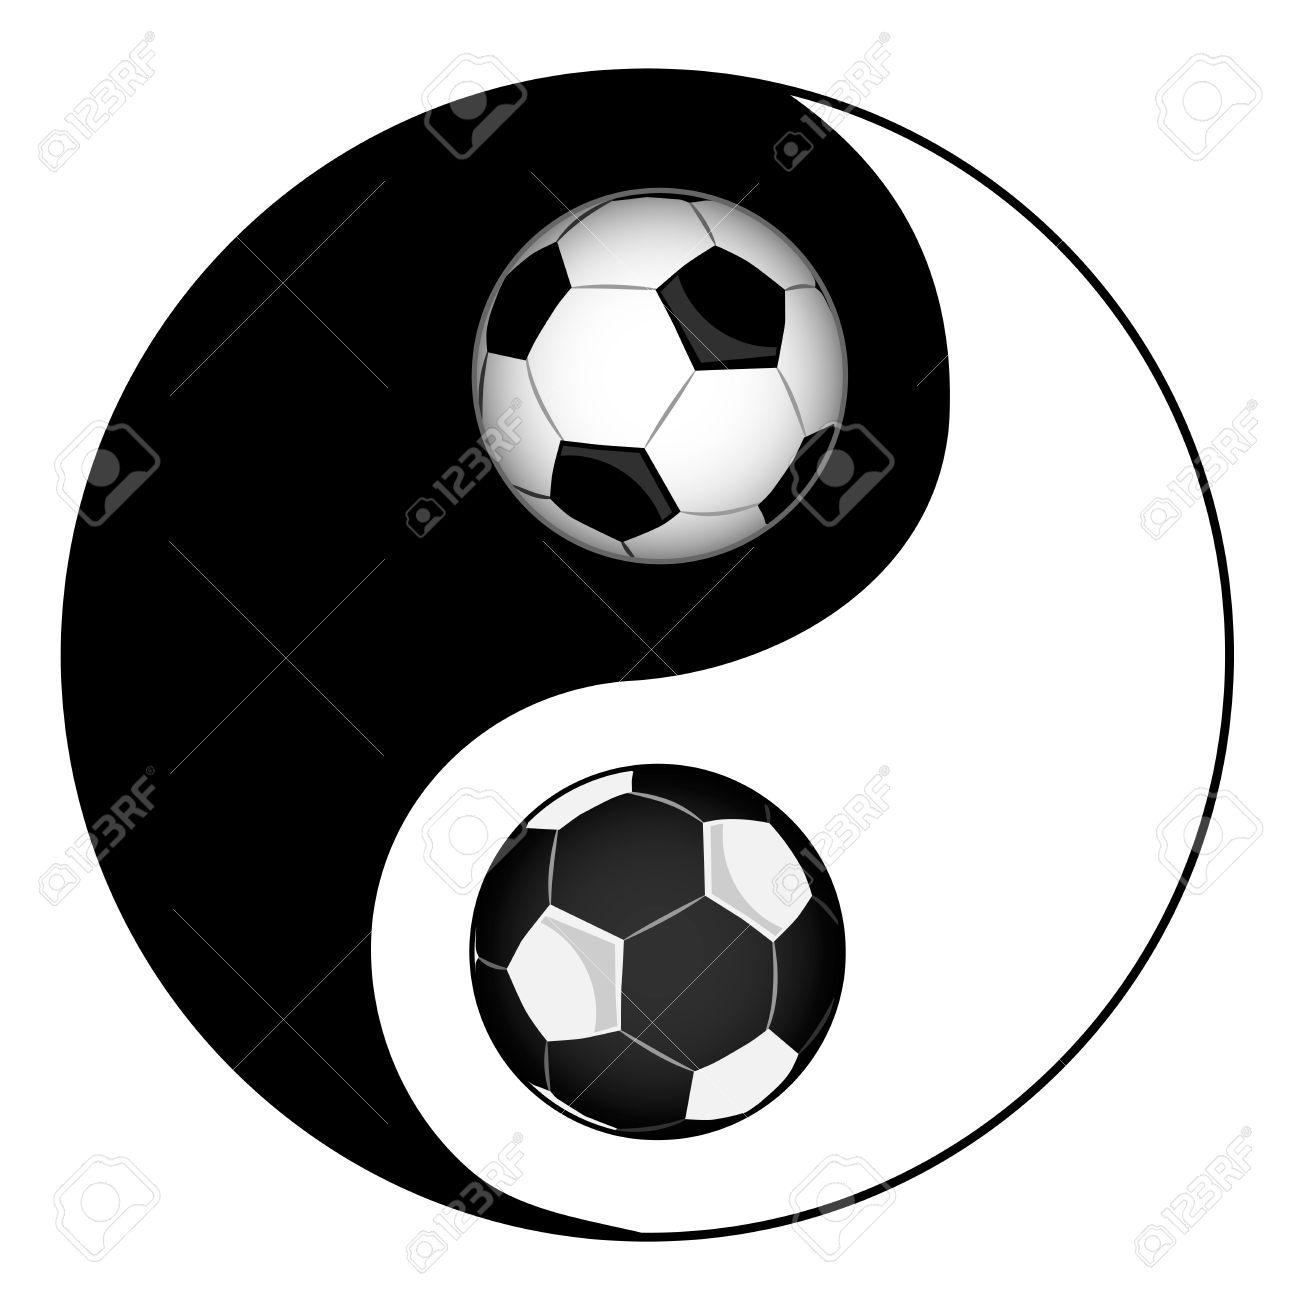 Football philosophy football yin yan symbol of harmony and football philosophy football yin yan symbol of harmony and balance stock vector 18902633 buycottarizona